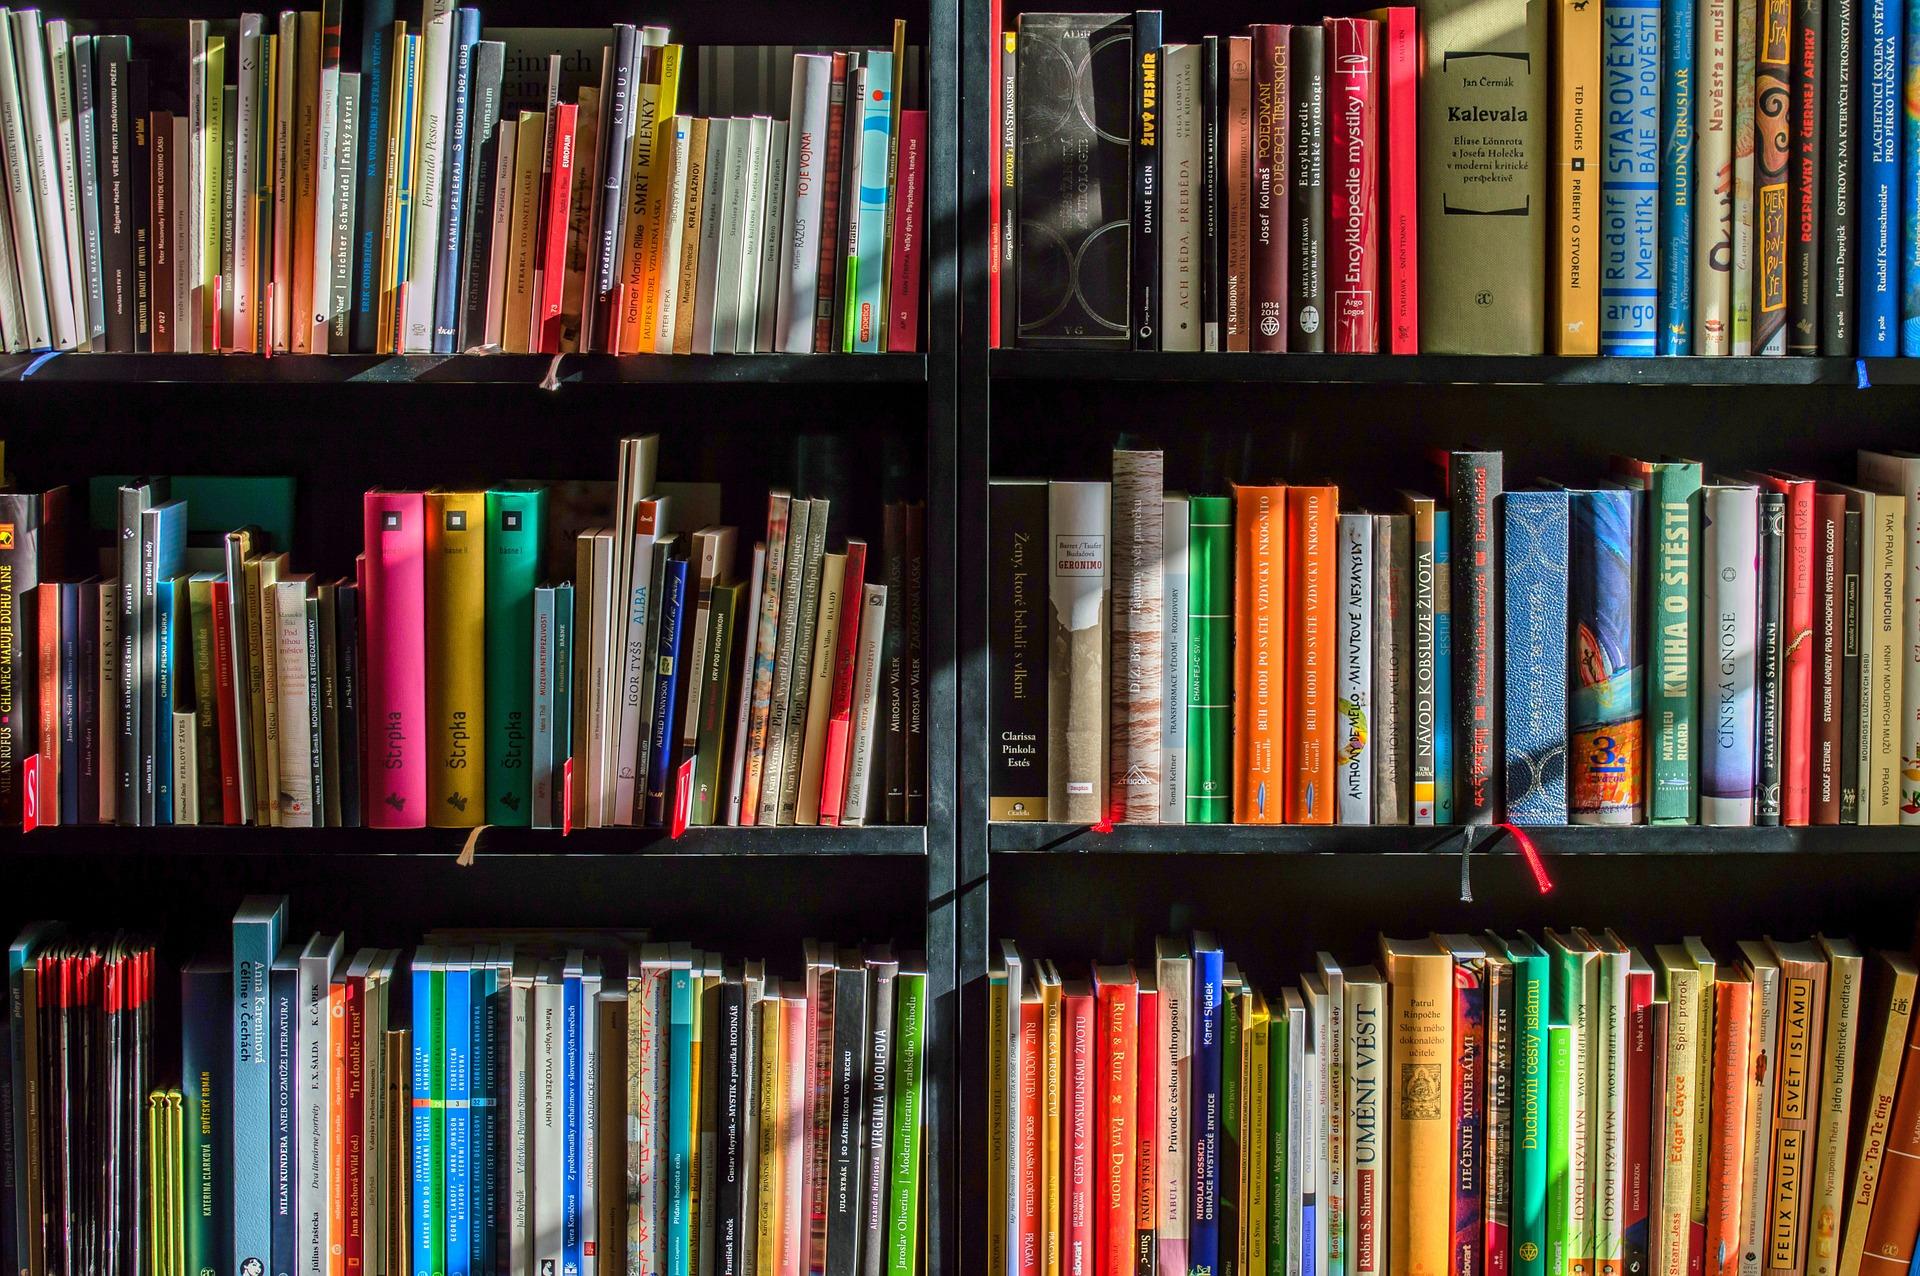 books 1204029 1920 13